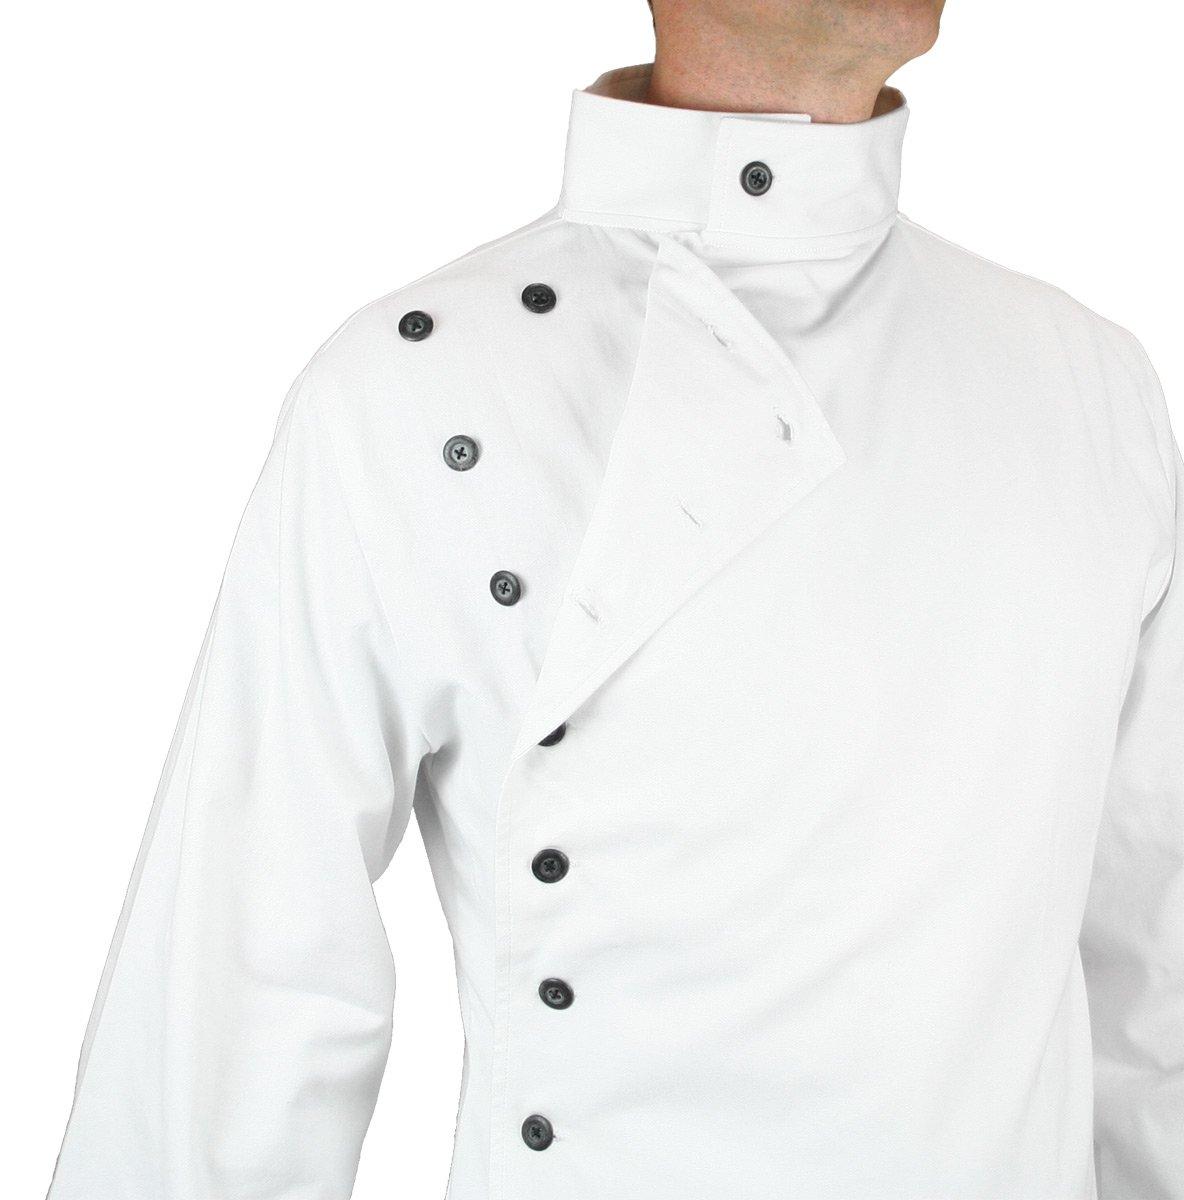 Historical Emporium Men's Cotton Twill Mad Scientist Howie Lab Coat XL/2X White by Historical Emporium (Image #4)